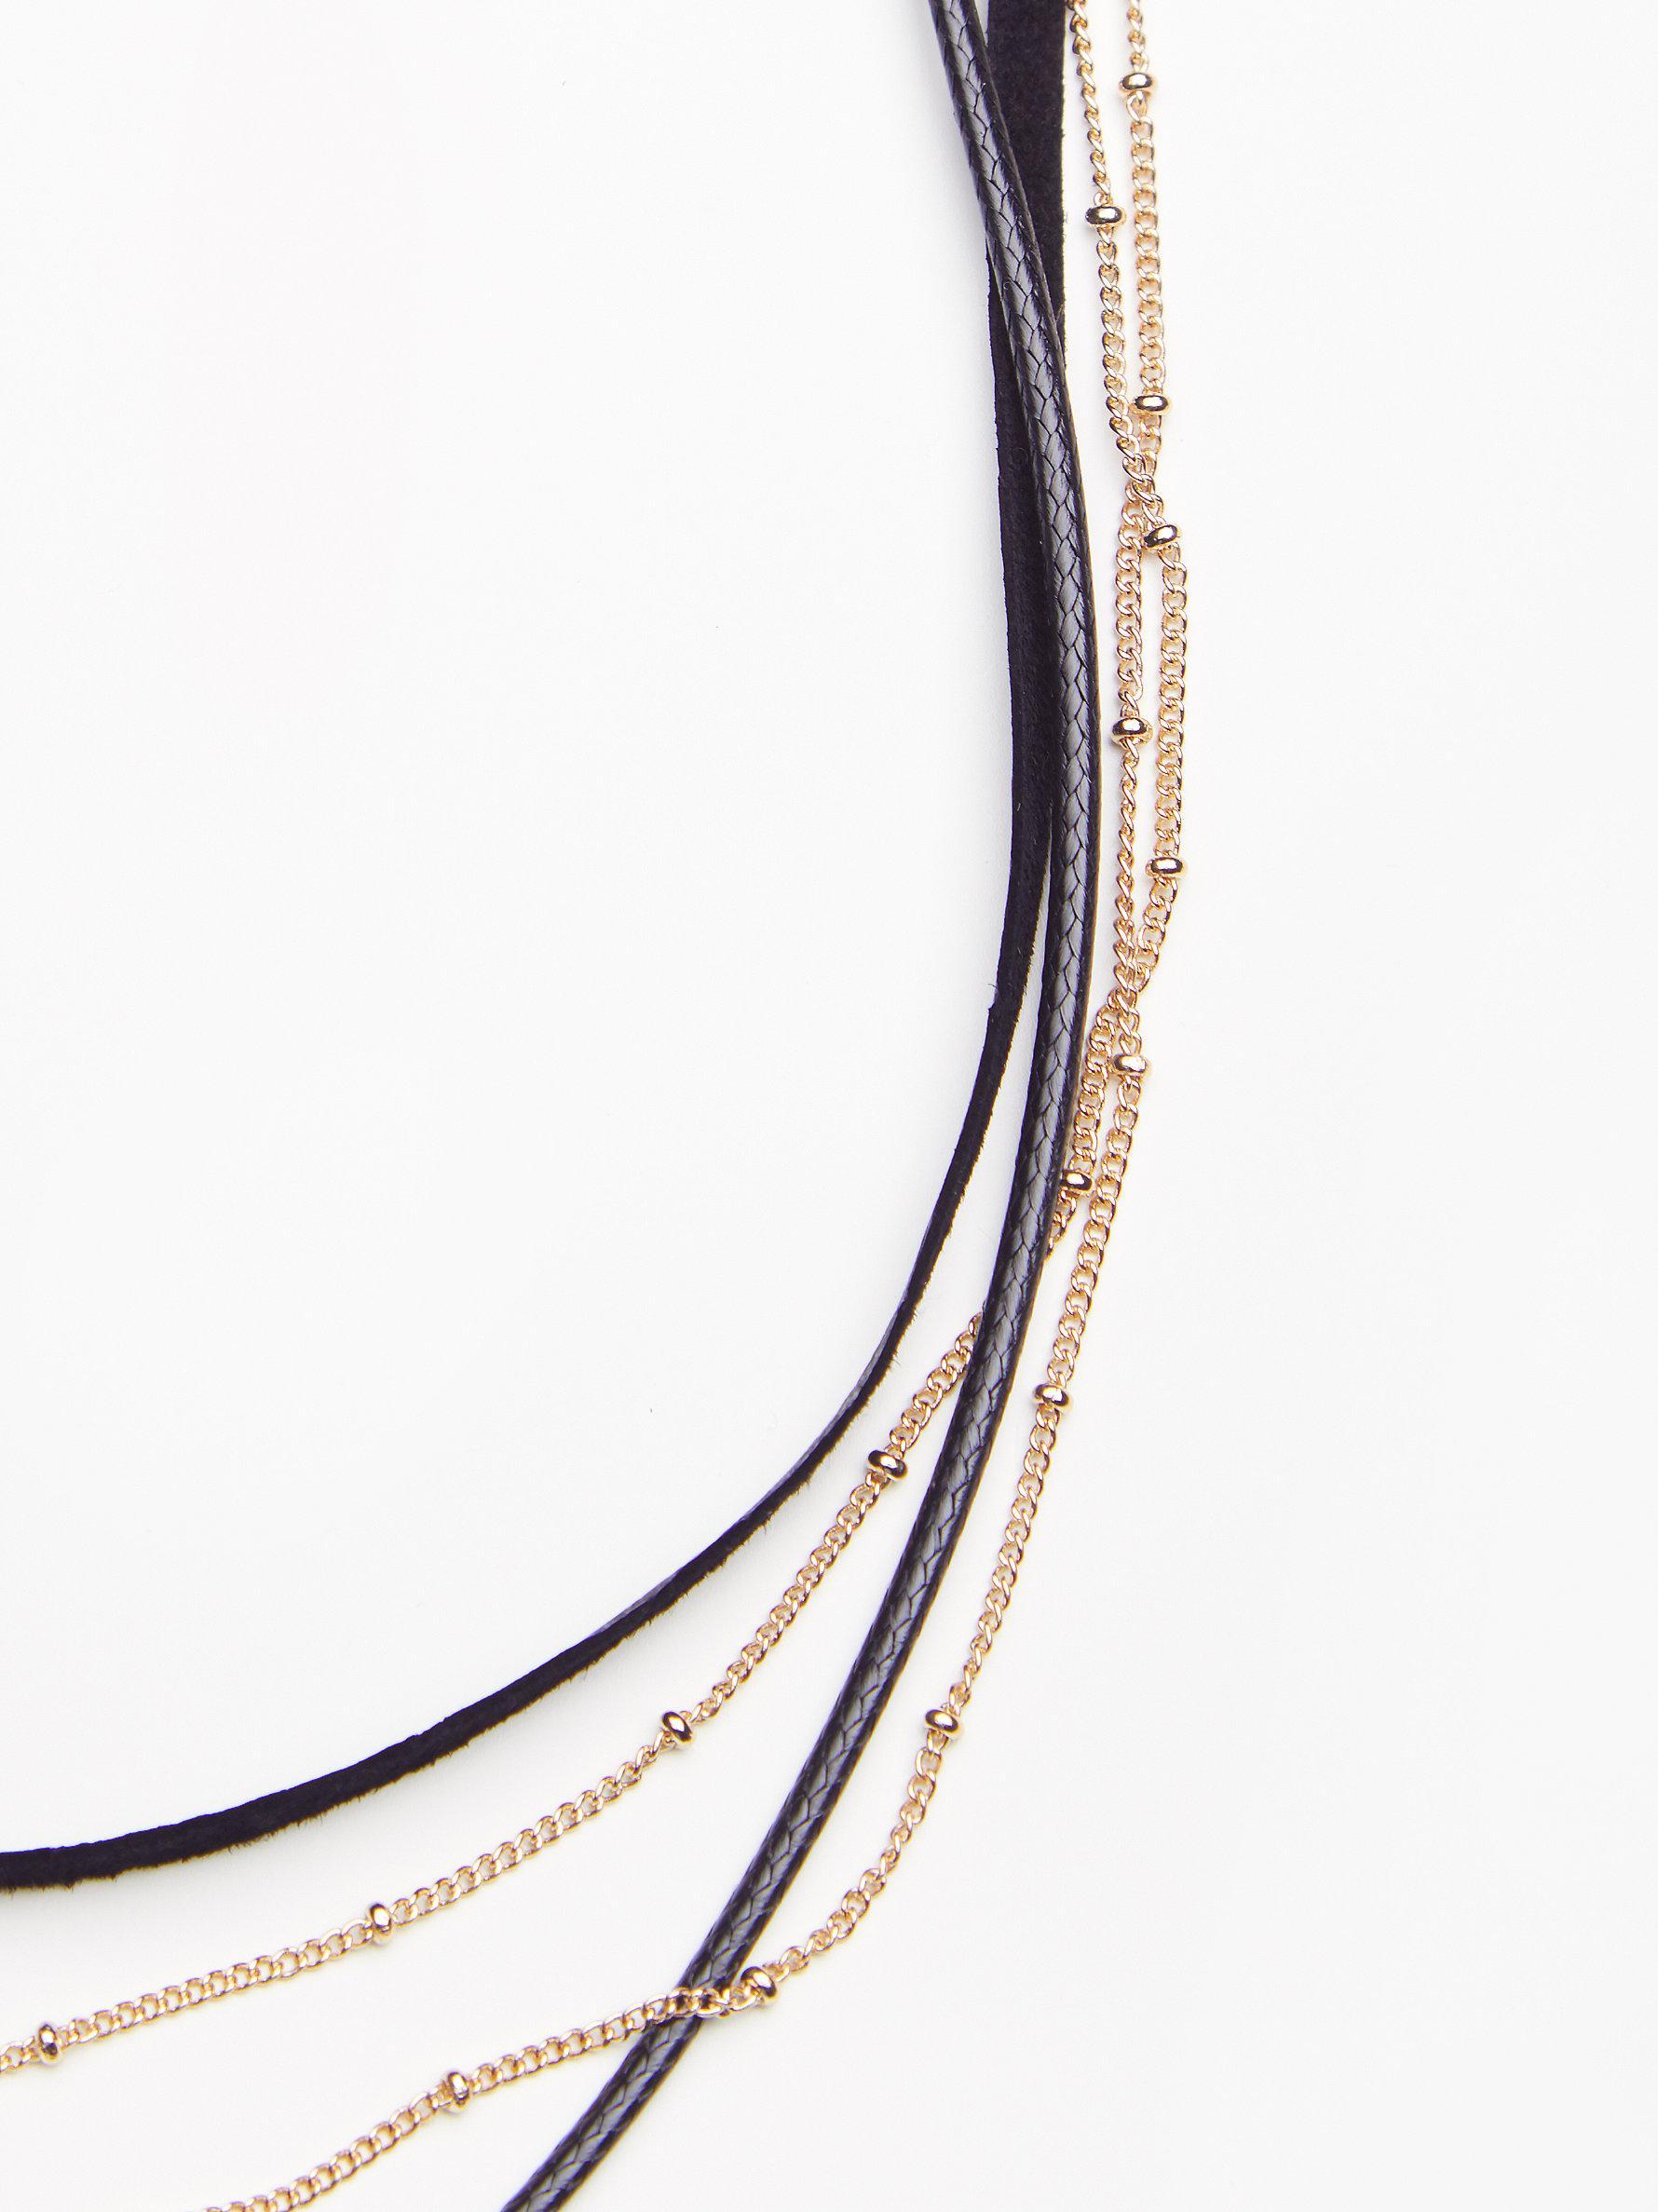 Free People Synthetic Wren Triple Horn Necklace in Black / Gold (Metallic)